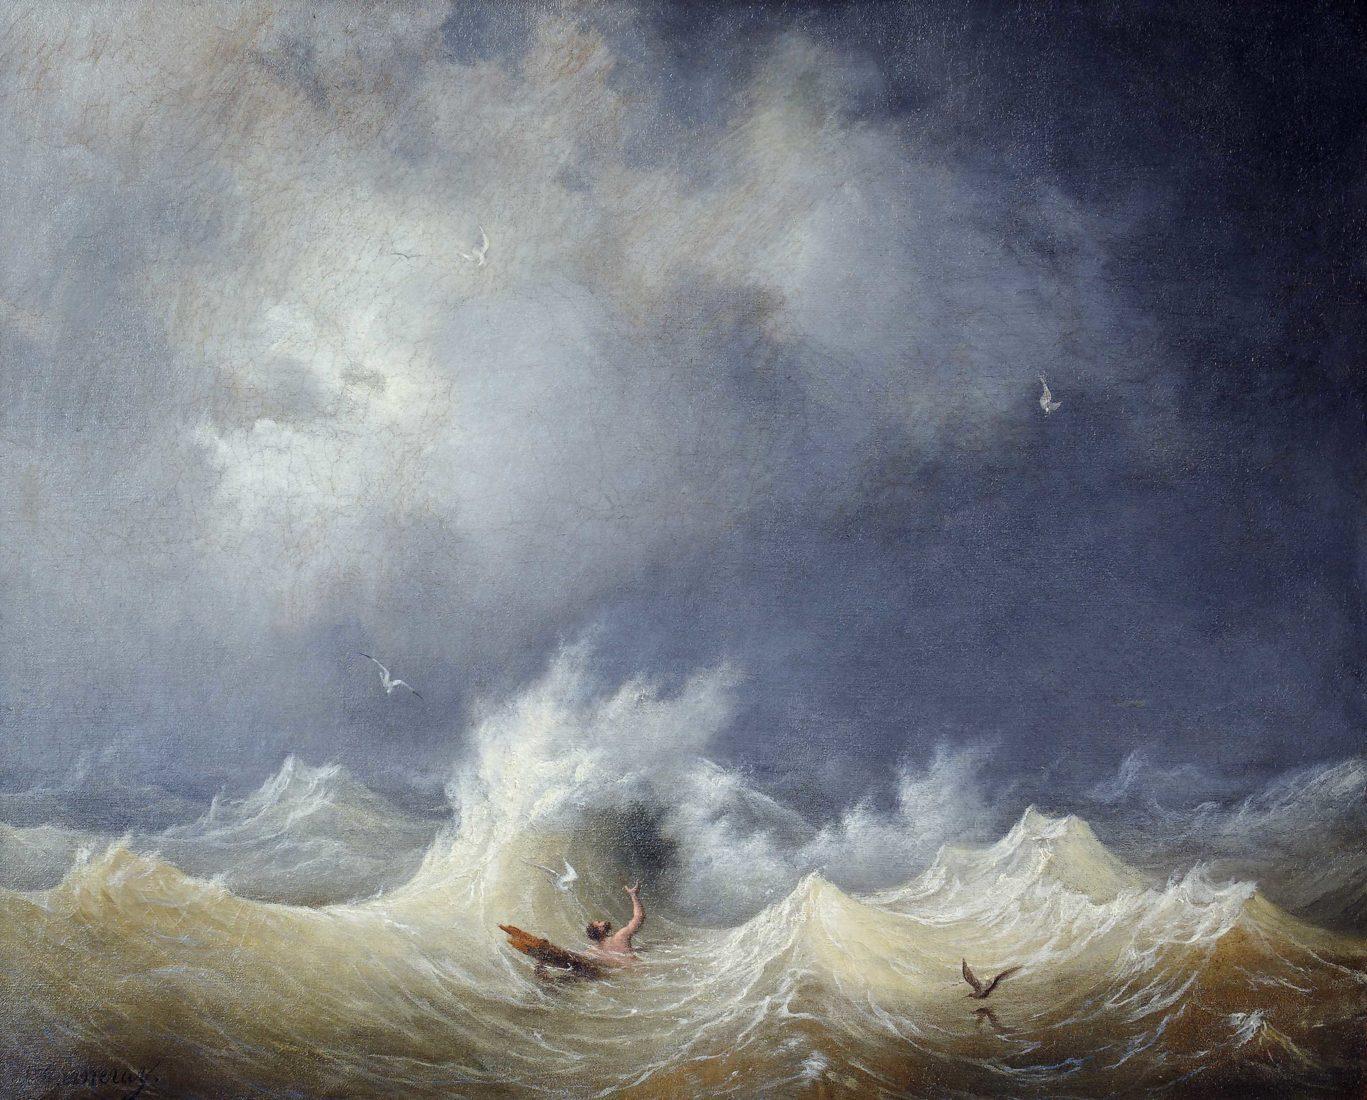 Louis Garneray, (1783 –1857), Le Naufragé,